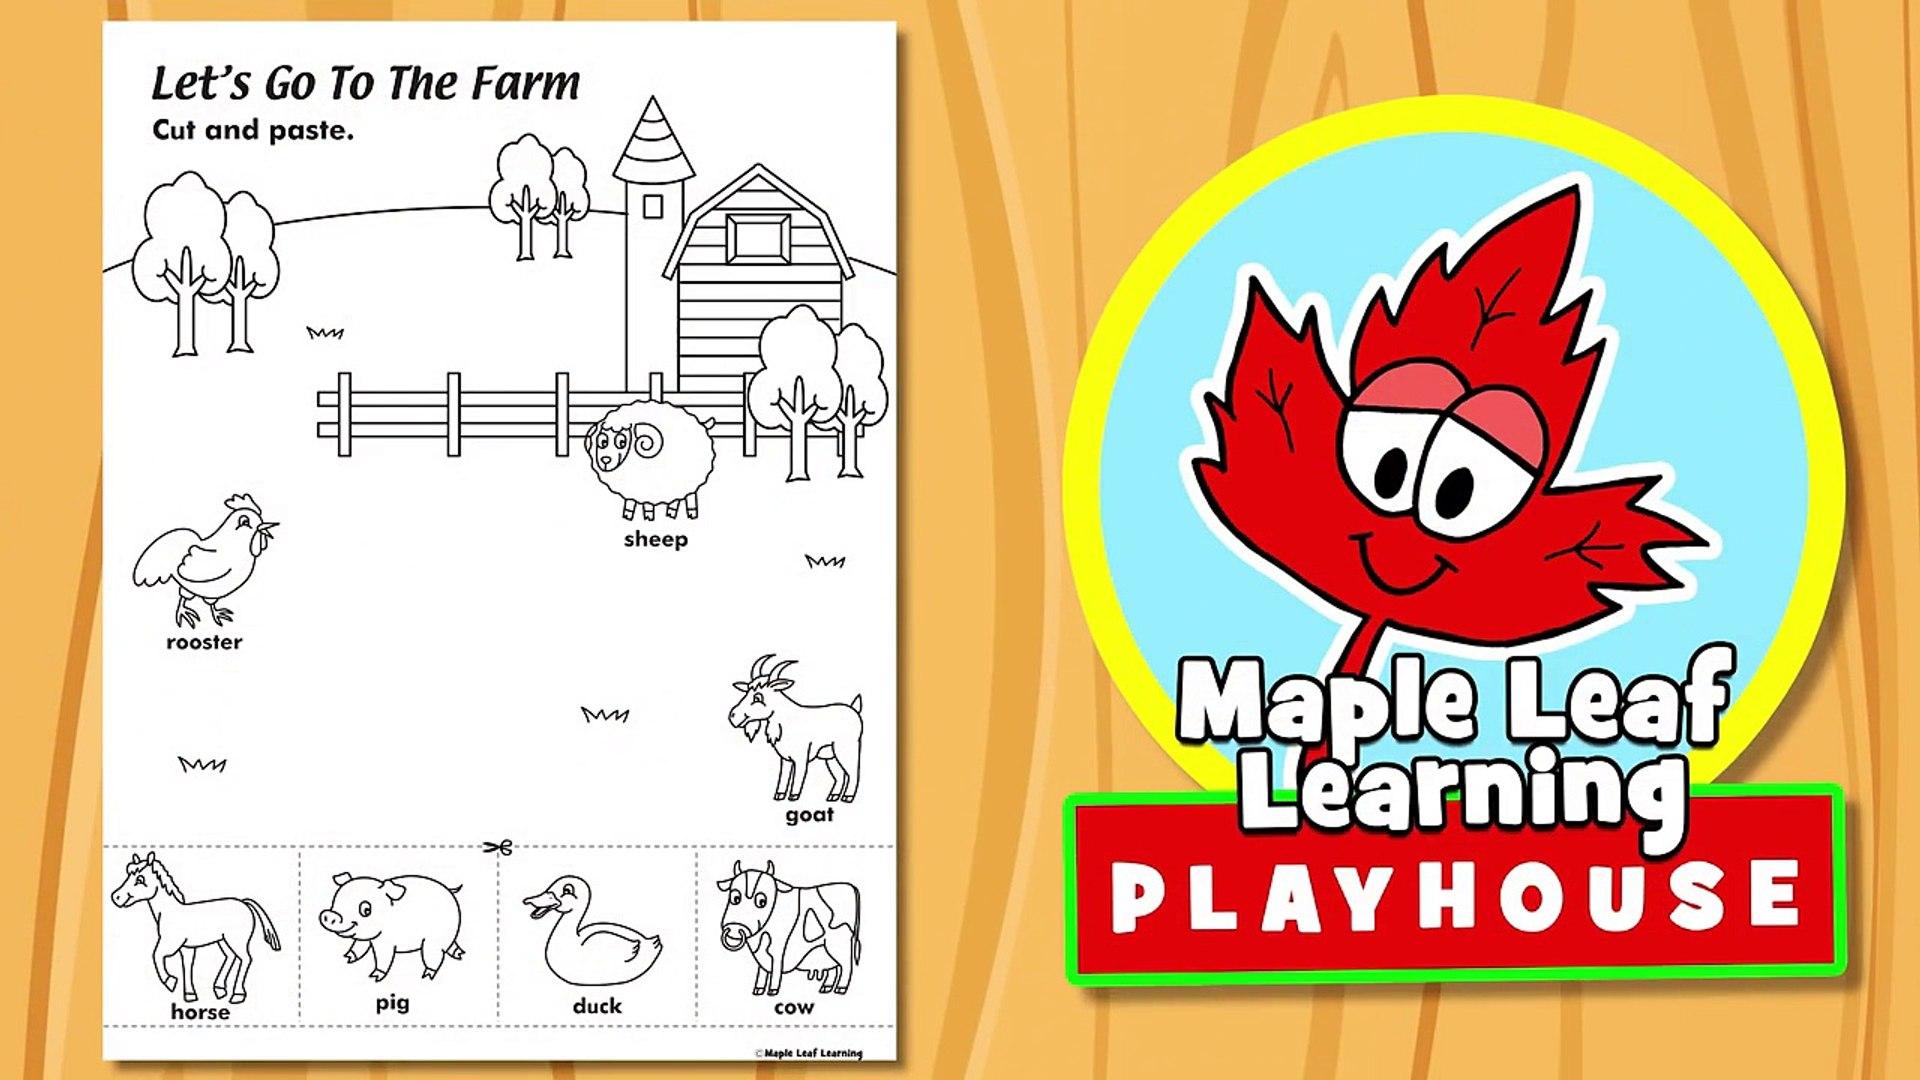 Farm Animal Activity for Kids | Maple Leaf Learning Playhouse